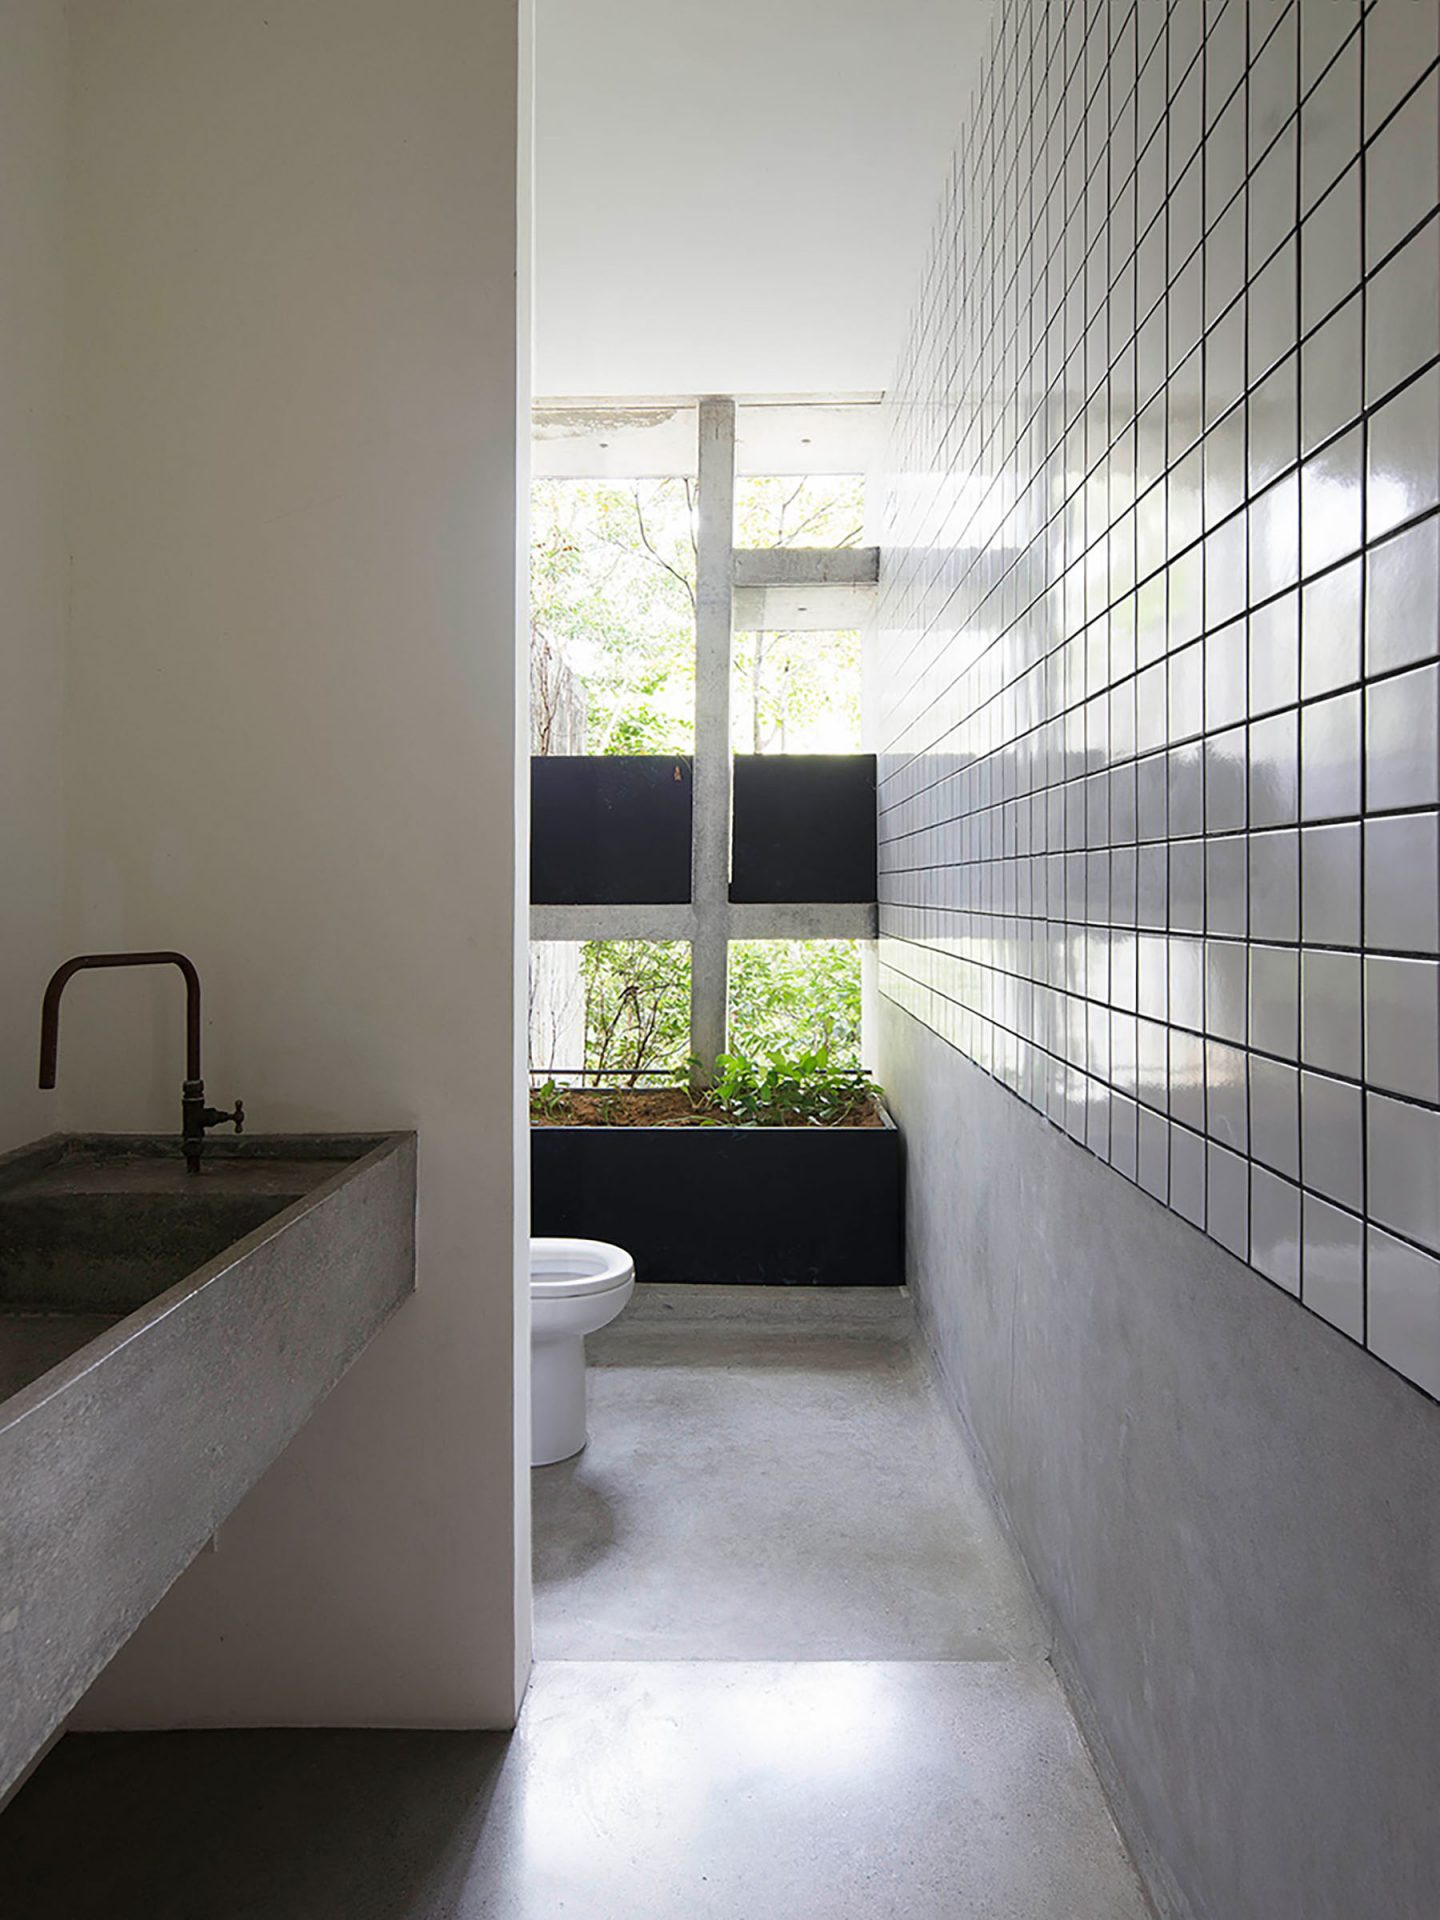 iGNANT-Architecture-Ben-Hosking-Chempenai-017